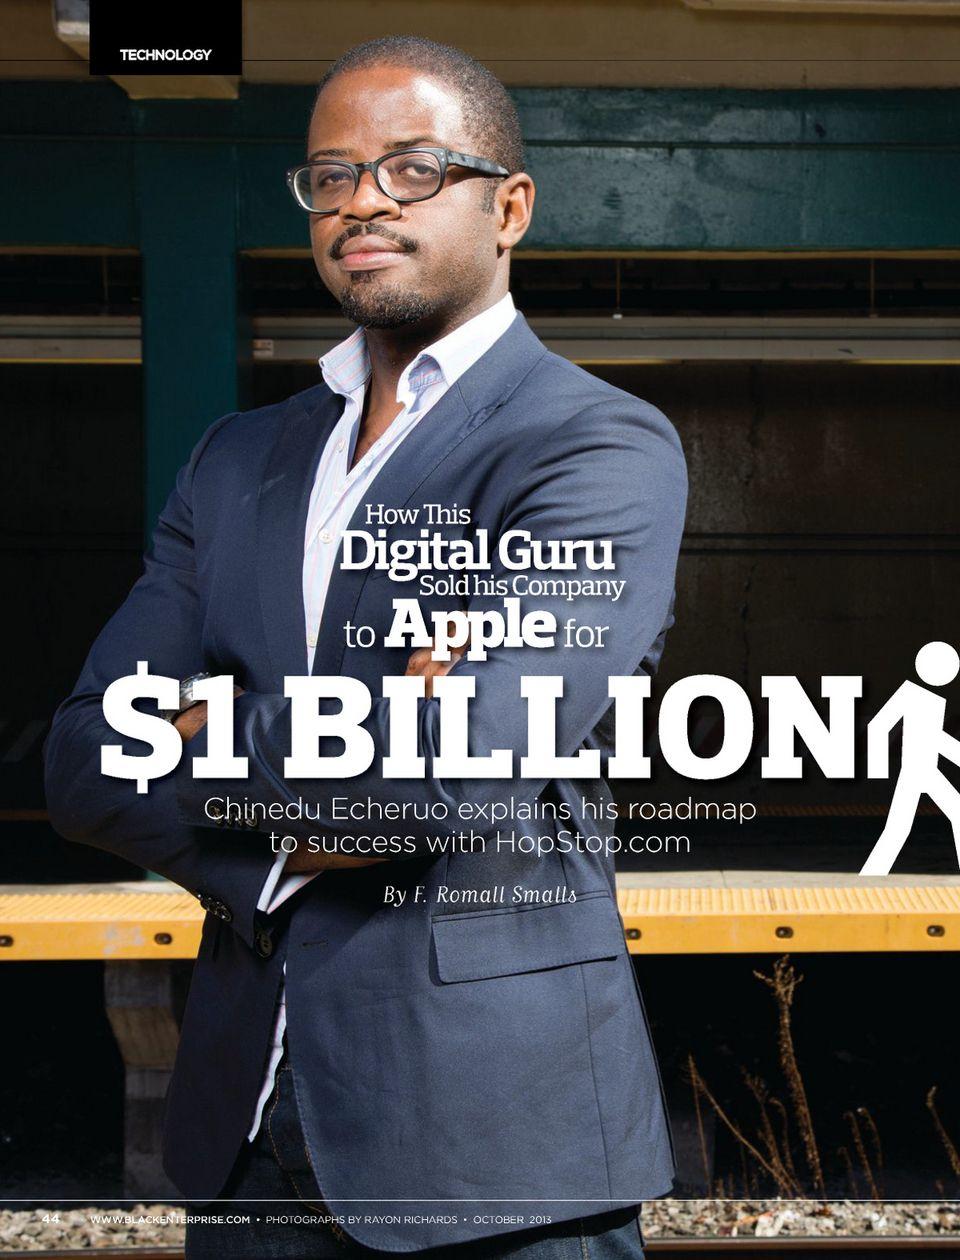 Apple inc buys nigerian born chinedu echeruos hopstop